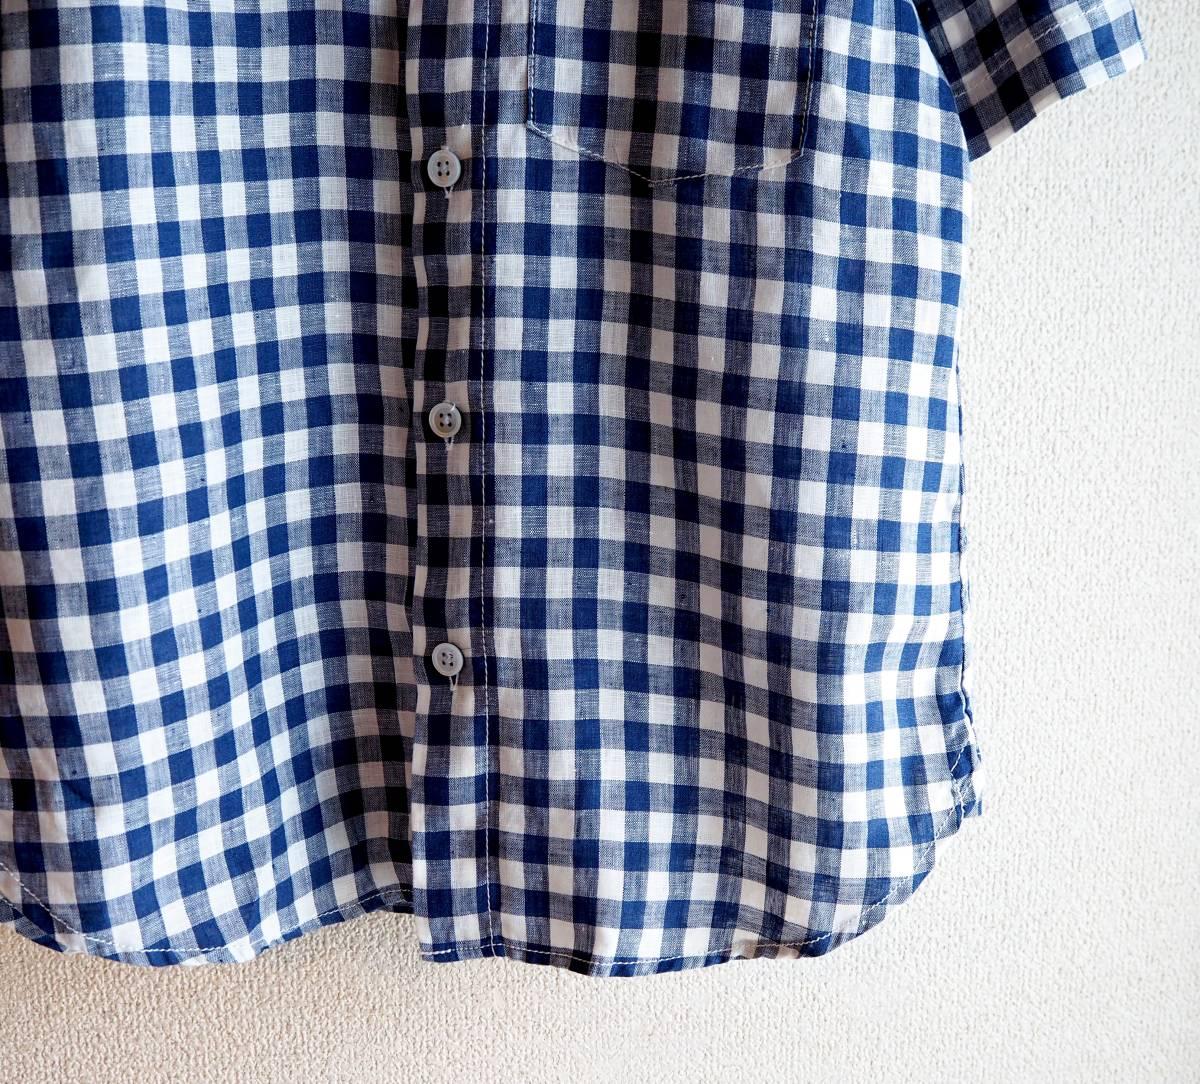 *prit プリット*ギンガムチェック柄 半袖シャツ ネイビー×ホワイト リネン100% 日本製_画像3